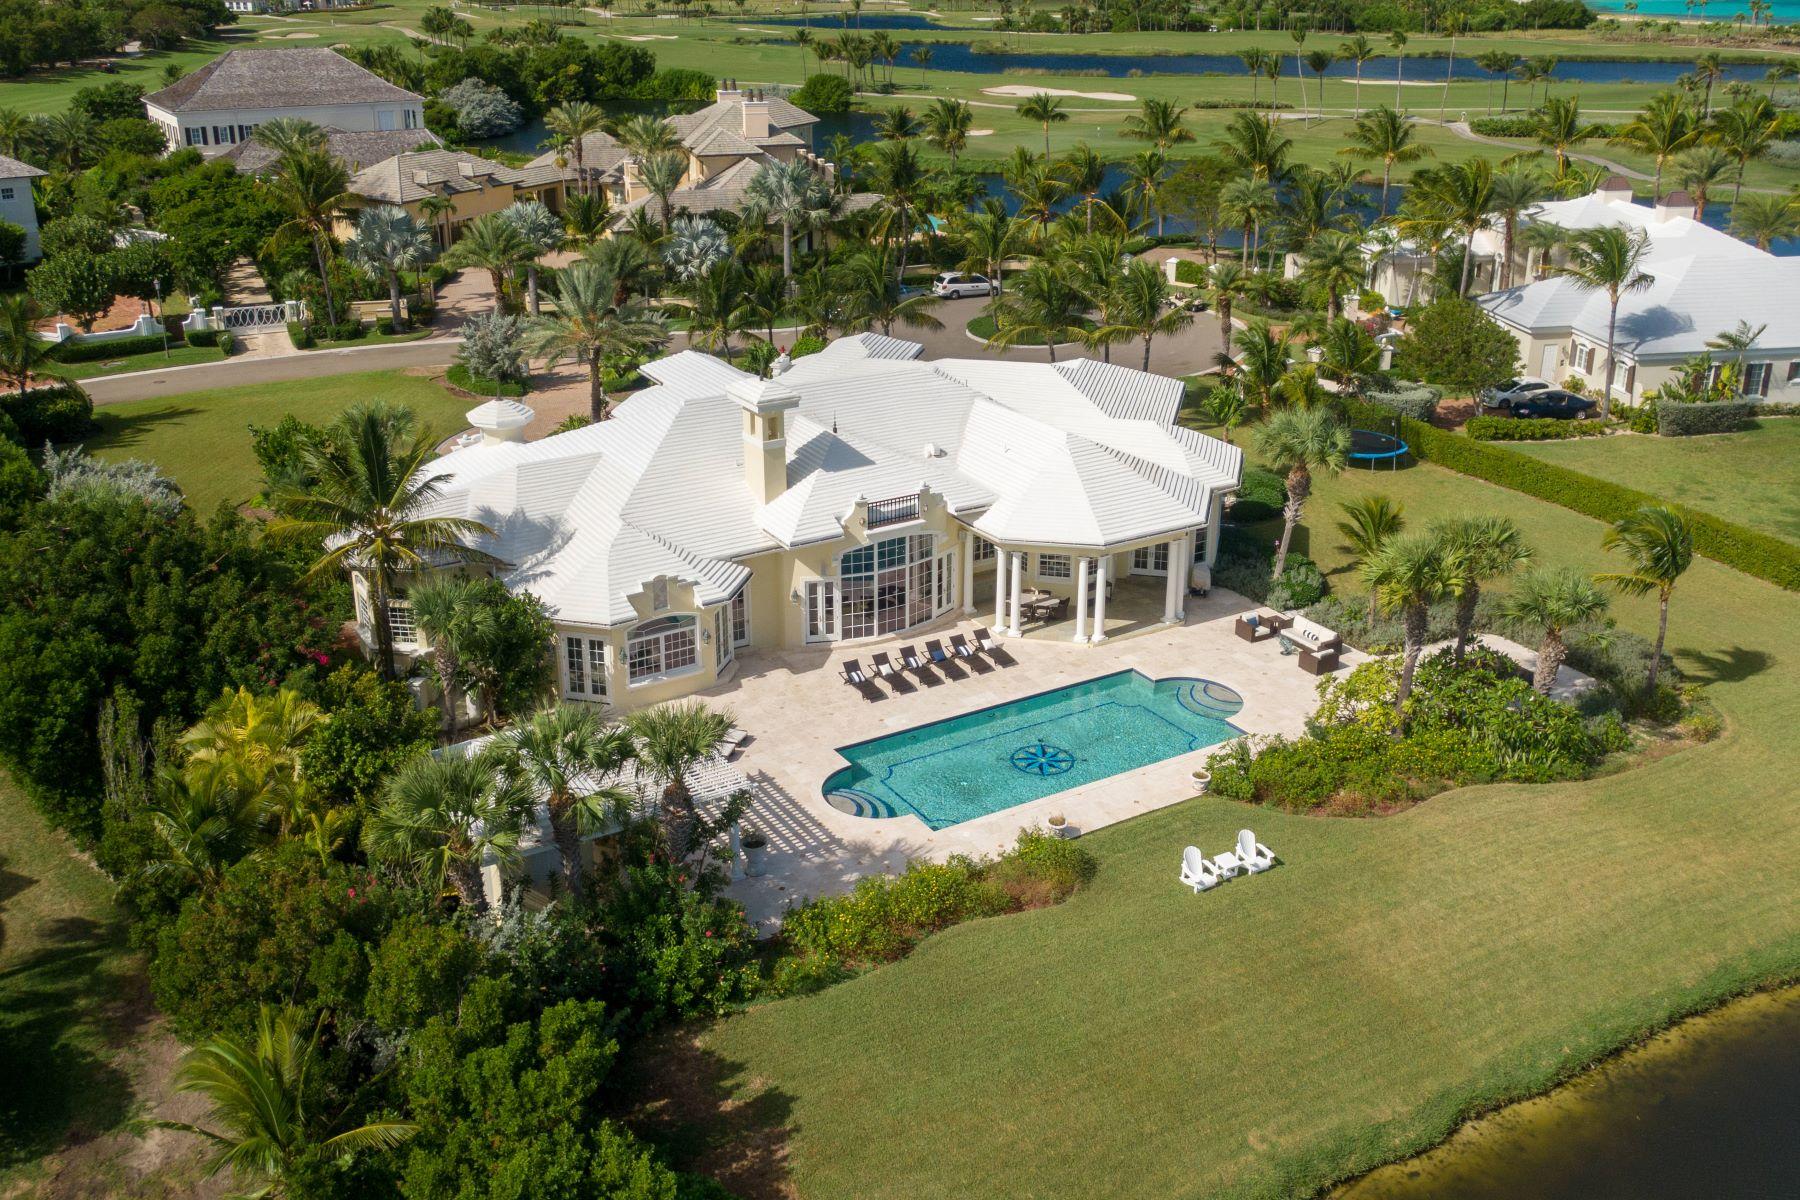 Single Family Home for Sale at Ocean Club Estates Ocean Club Estates, Paradise Island, Nassau And Paradise Island Bahamas